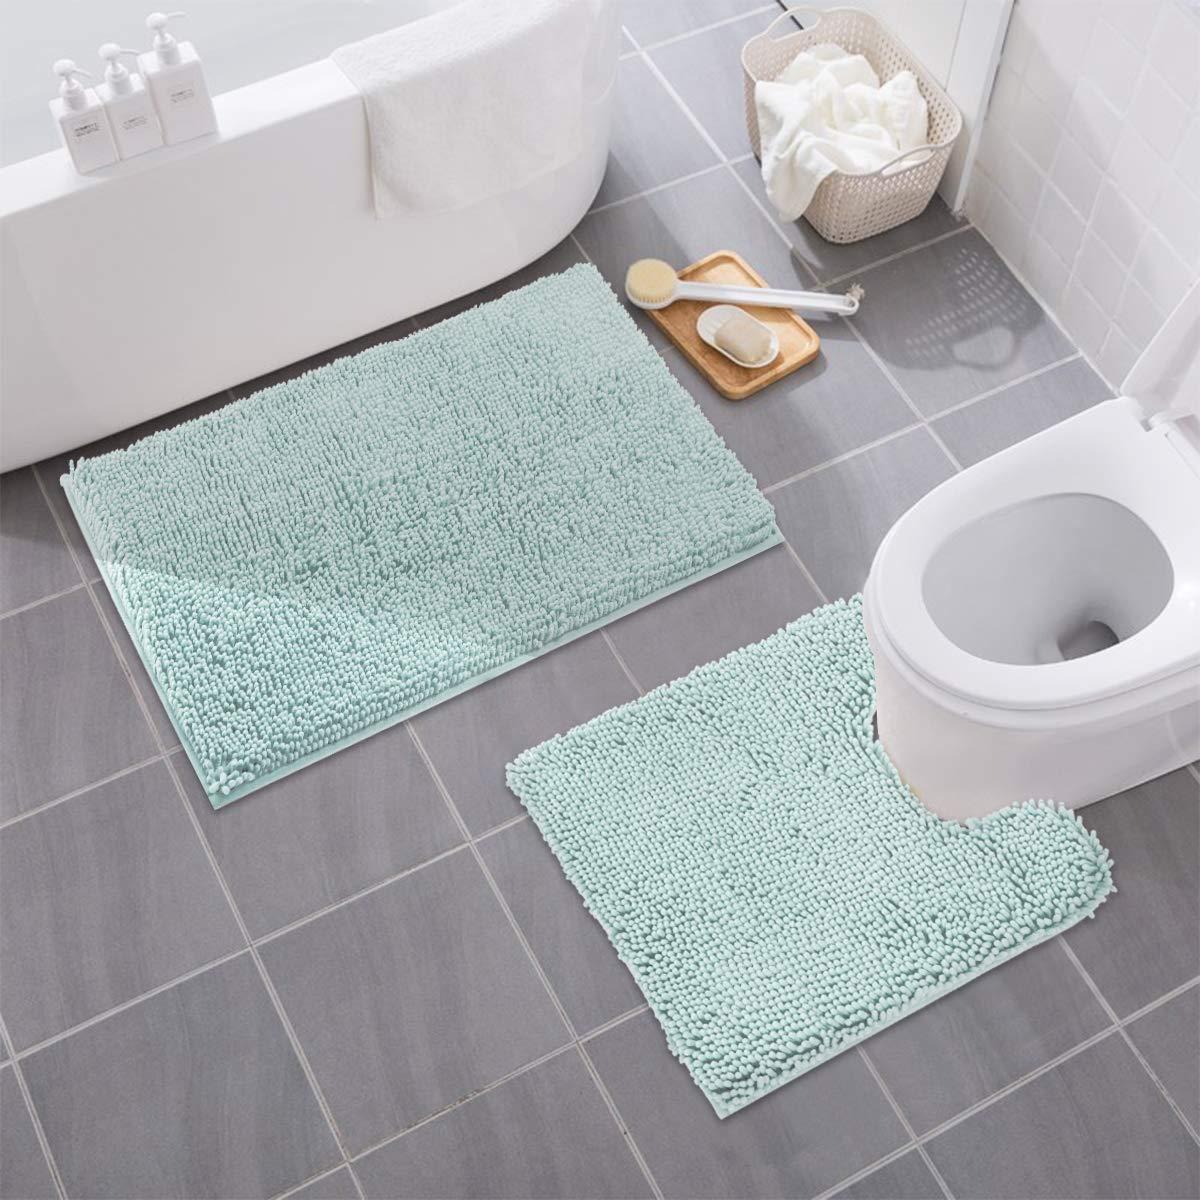 "MAYSHINE Bathroom Rug Toilet Sets and Shaggy Non Slip Machine Washable Soft Microfiber Bath Contour Mat (Spa Blue,32"" 20""/20"" 20"" U-Shaped)"